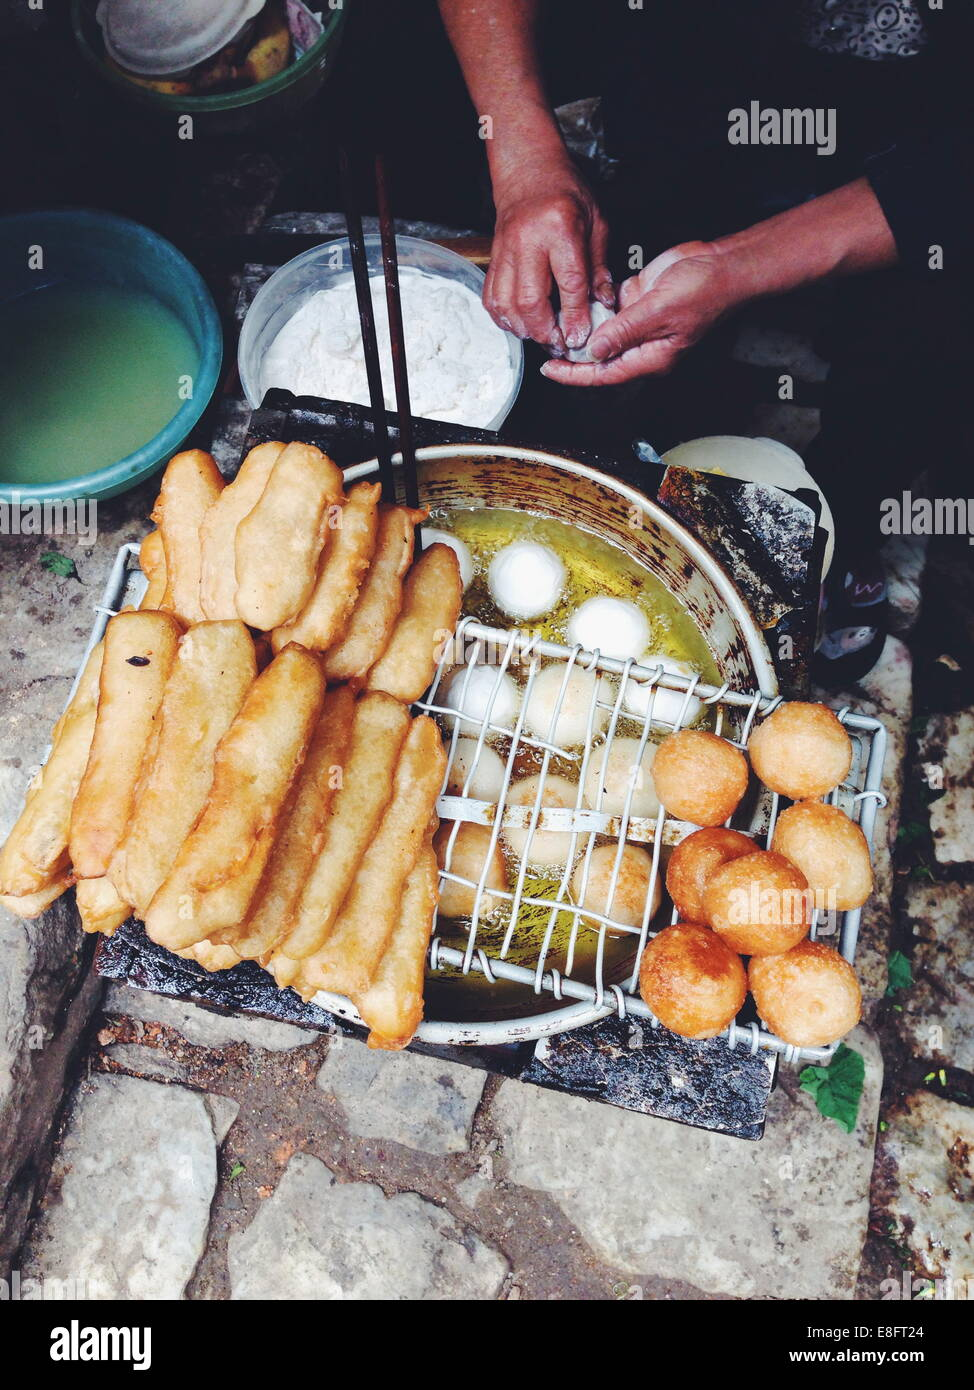 Vietnam, Lao Cai Province, Sa Pa, Woman frying dough on the street - Stock Image